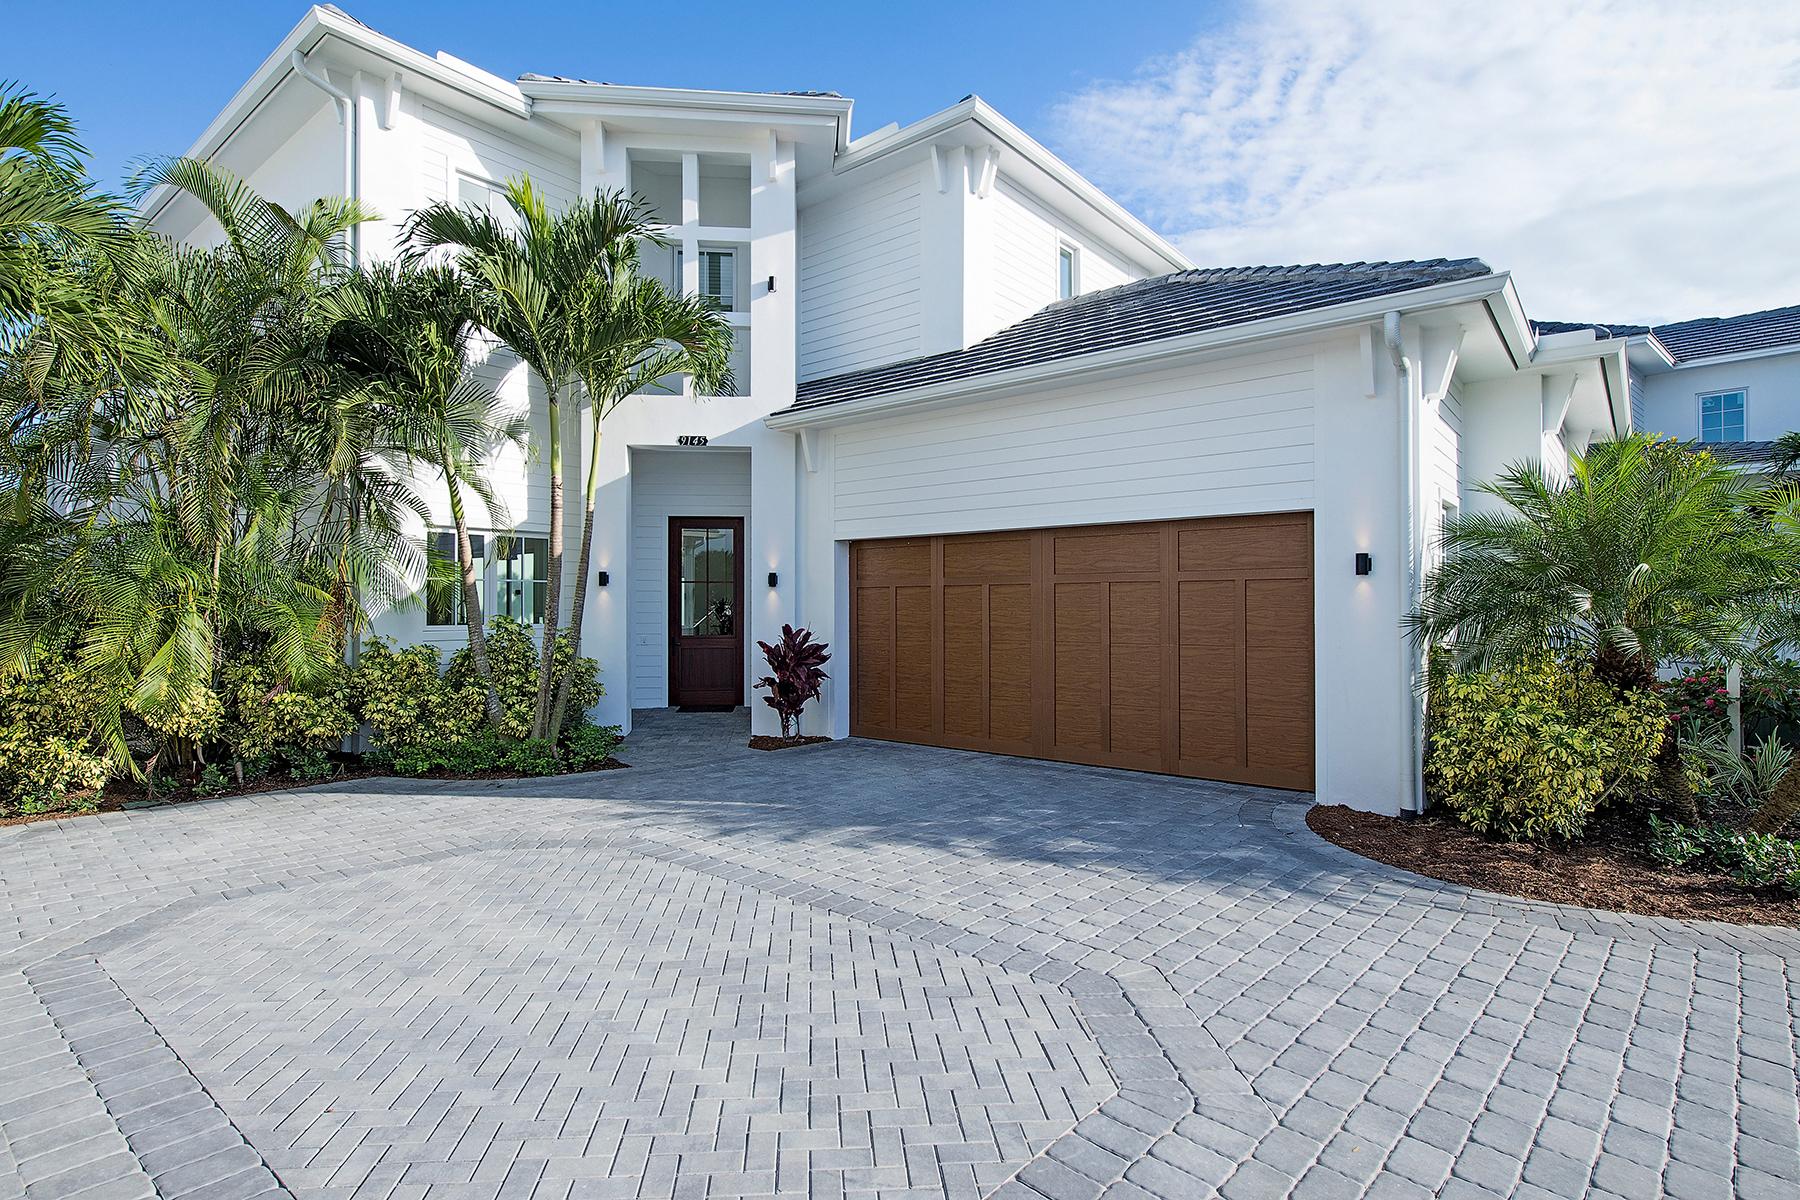 Vivienda unifamiliar por un Venta en 9201 Mercato Way , Naples, FL 34108 9201 Mercato Way Naples, Florida, 34108 Estados Unidos